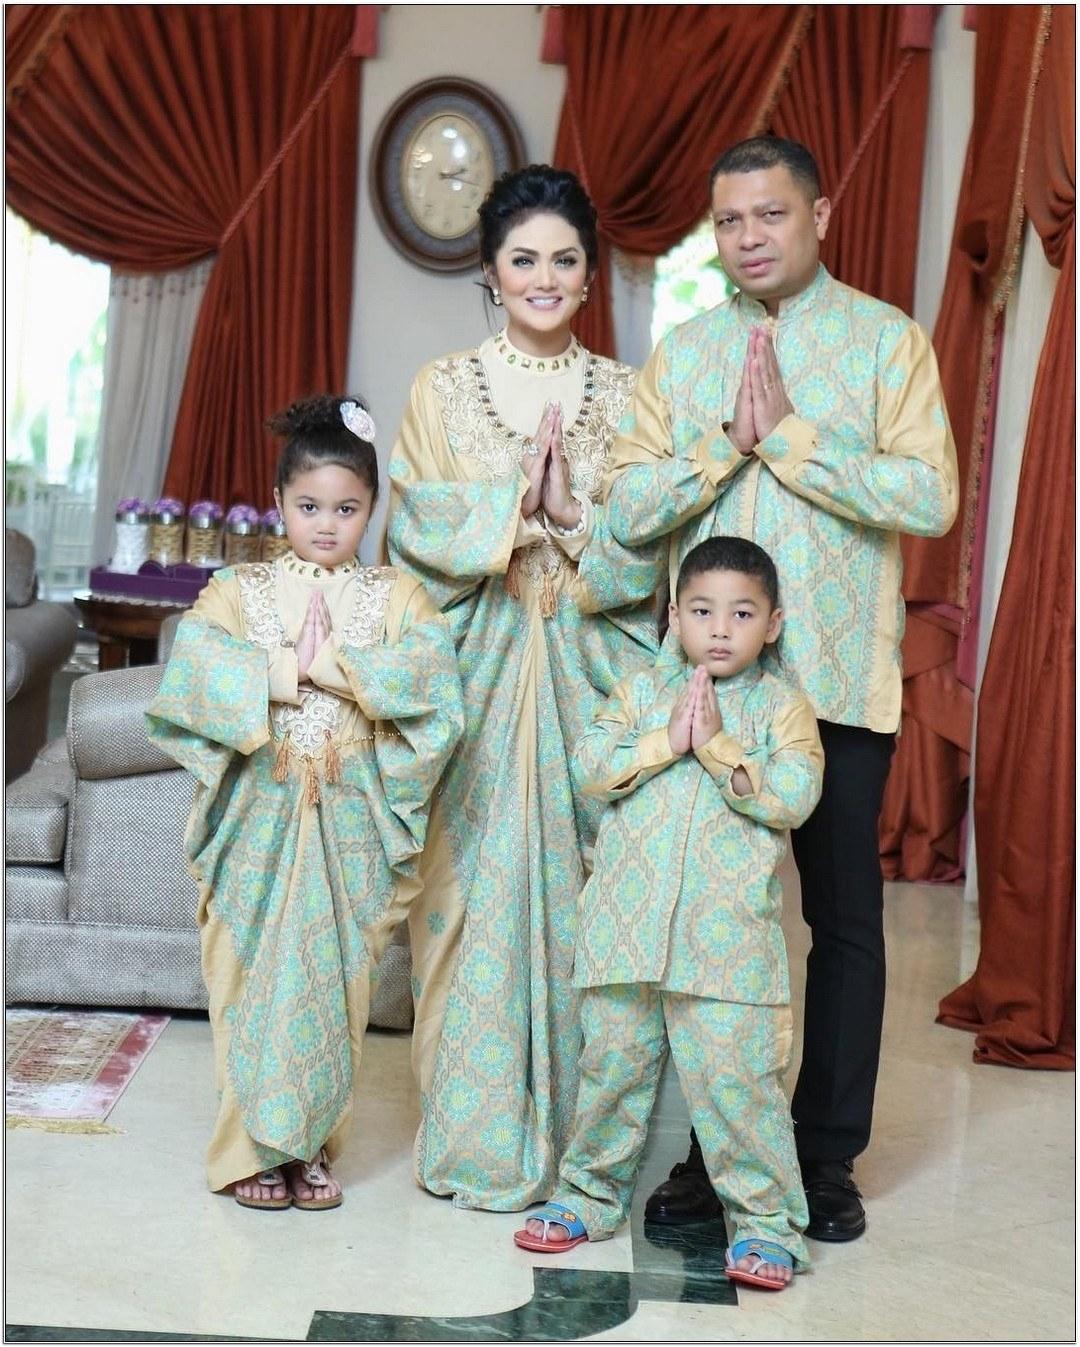 Bentuk Gambar Baju Lebaran Keluarga Qwdq Model Baju Seragam Lebaran Artis